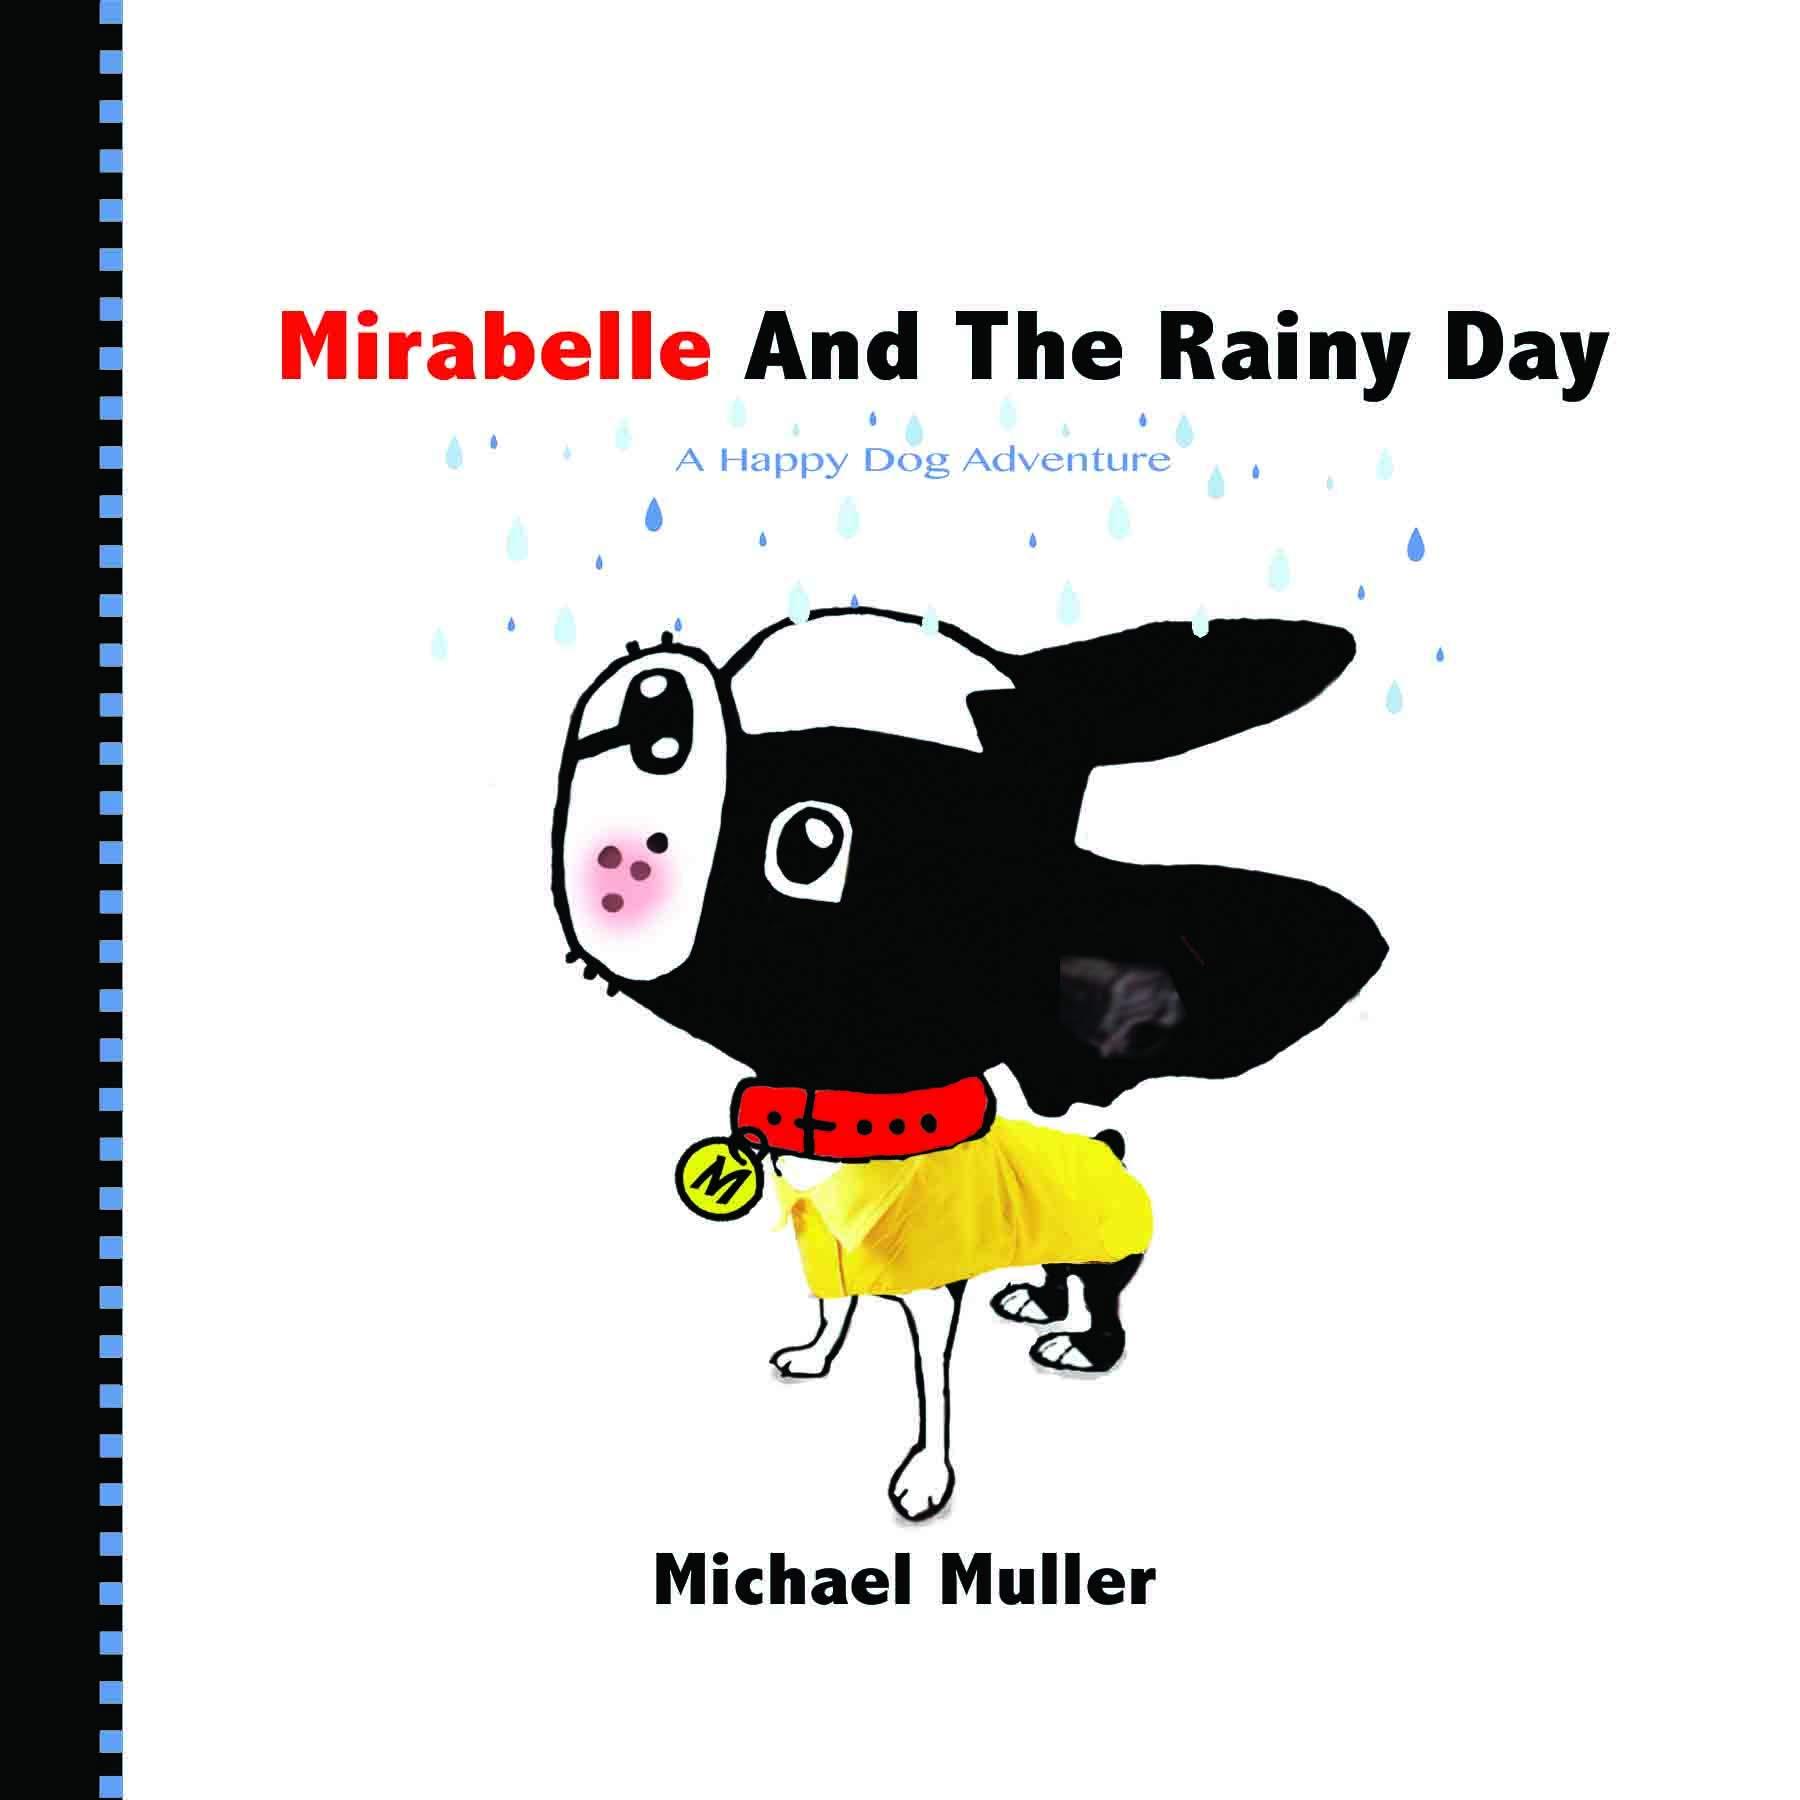 mirabellerainy.jpg